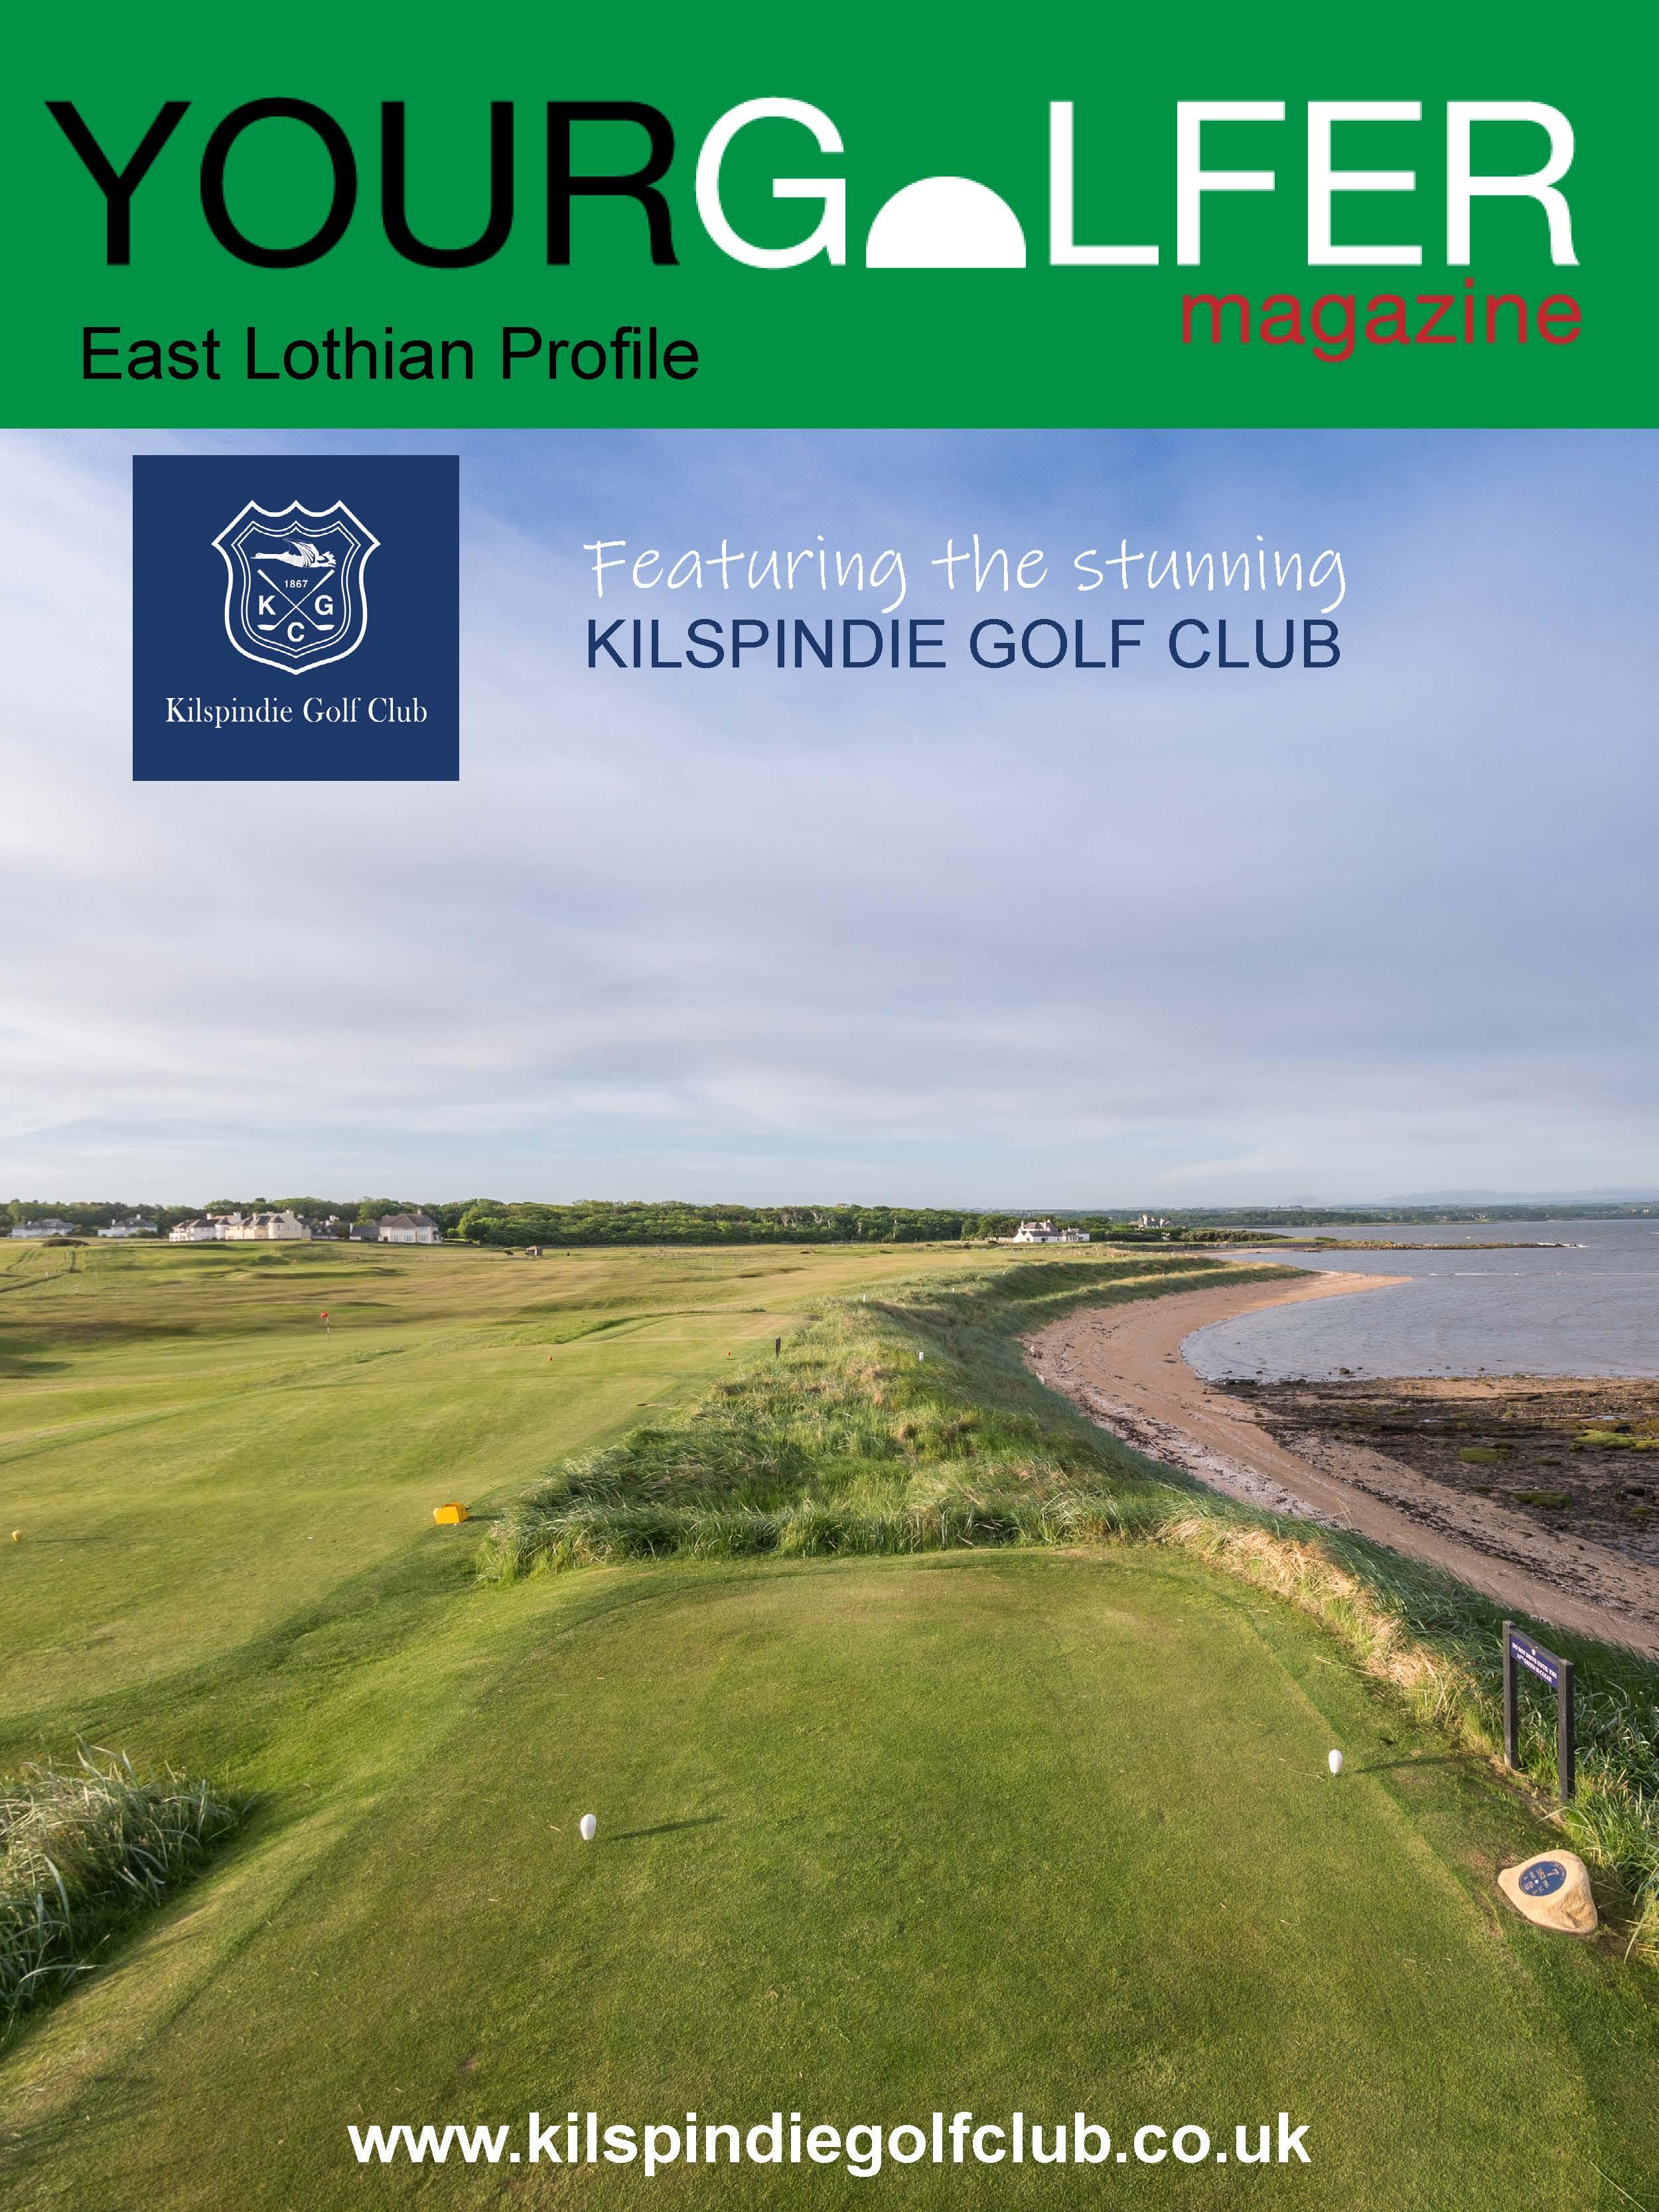 East Lothian profile your golfer magazine